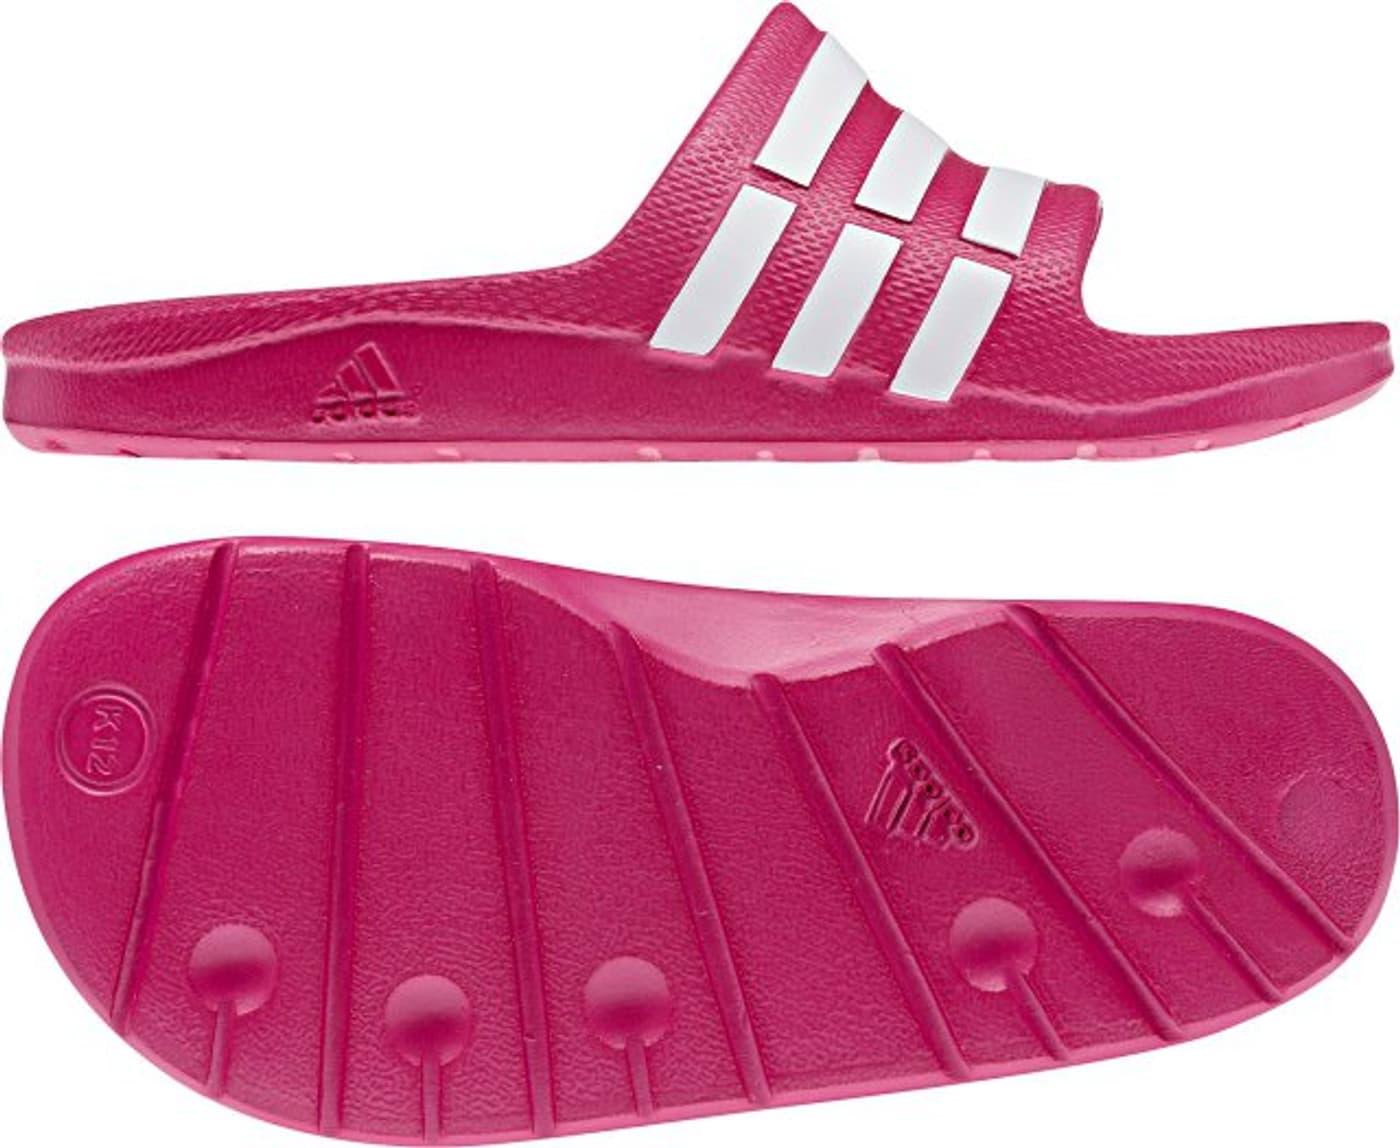 100% authentic e77e5 0730d Adidas Duramo Slide Sandali da bambino